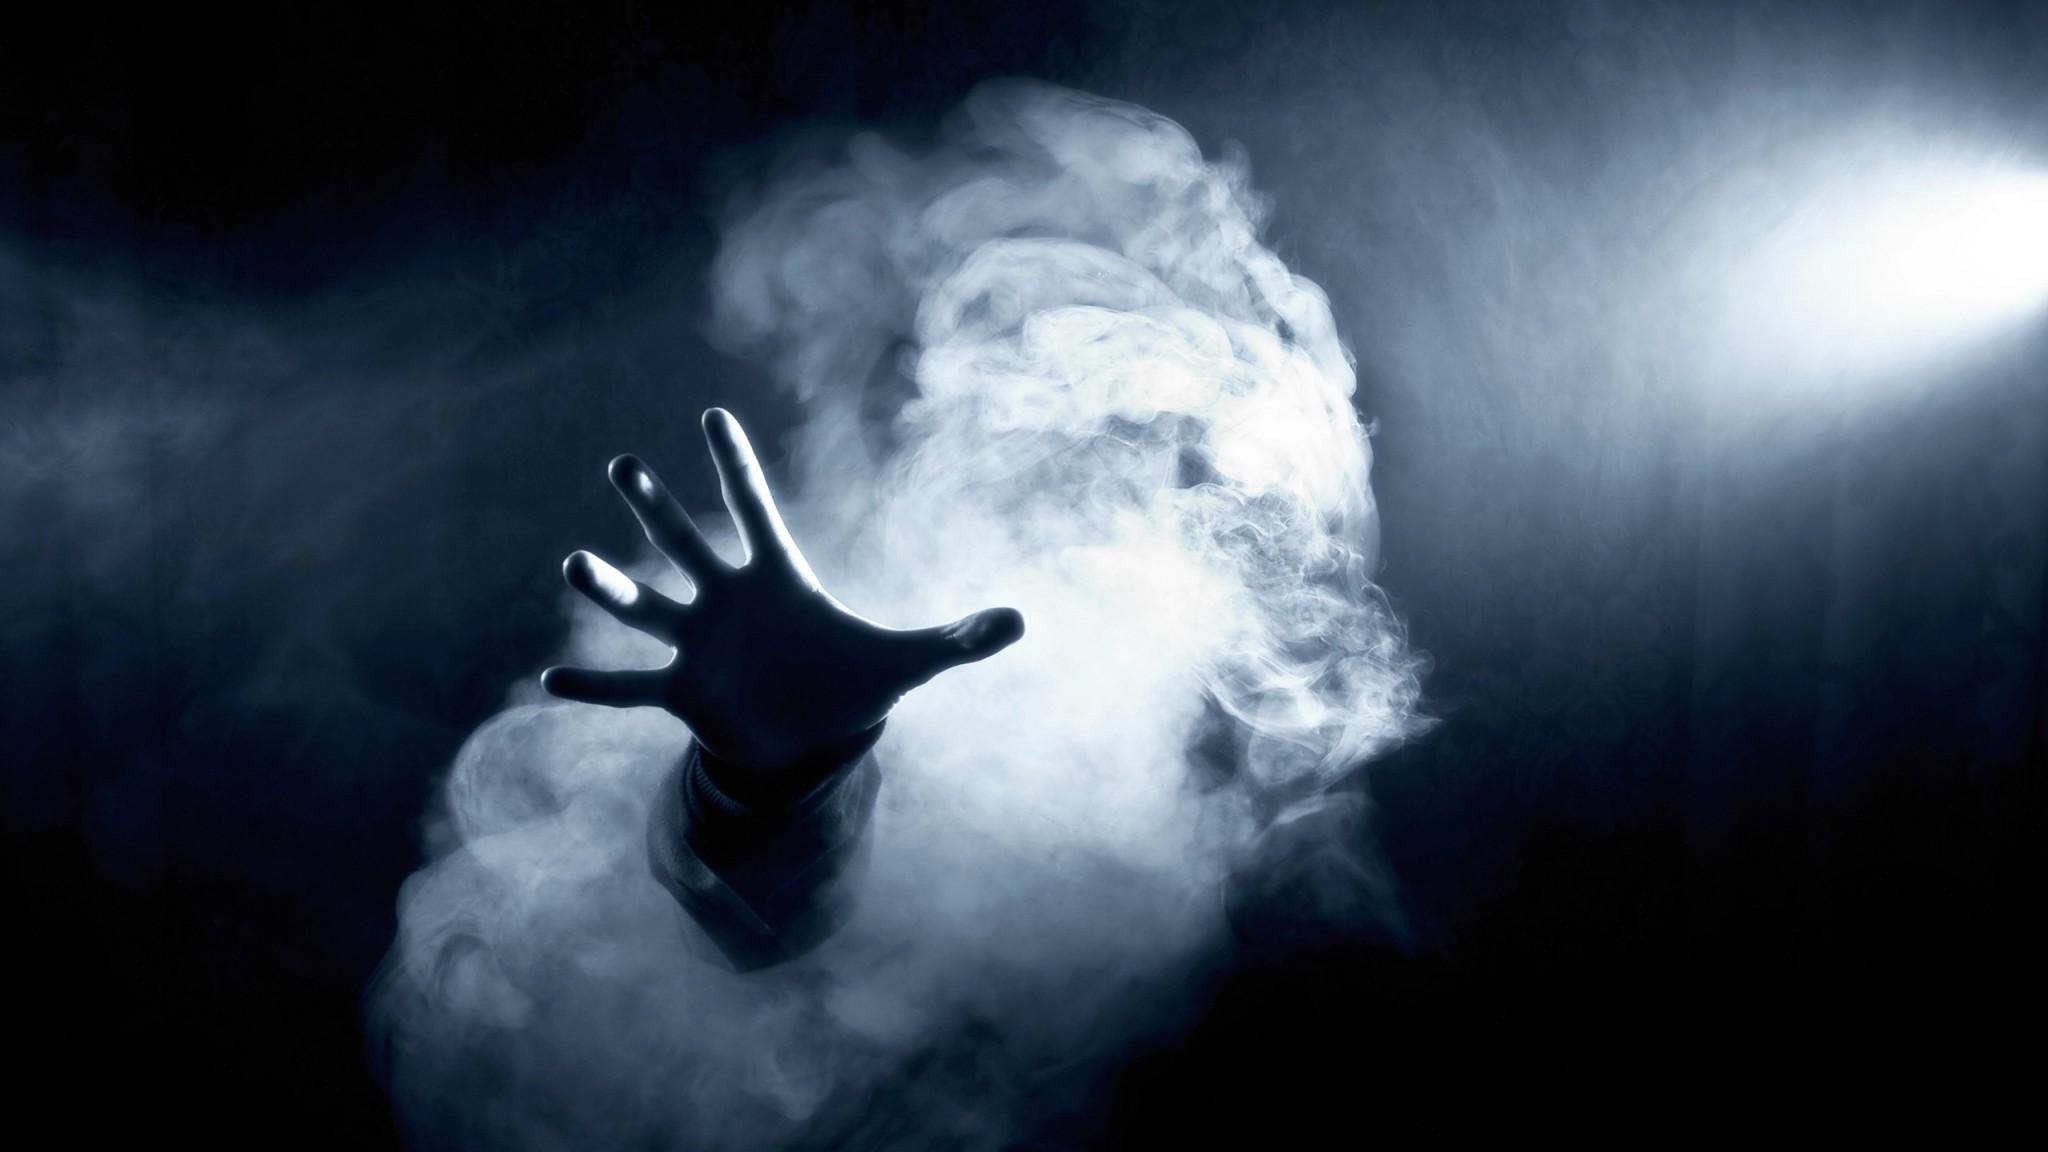 Download Wallpaper Dark, Hand, Smoke HD HD .